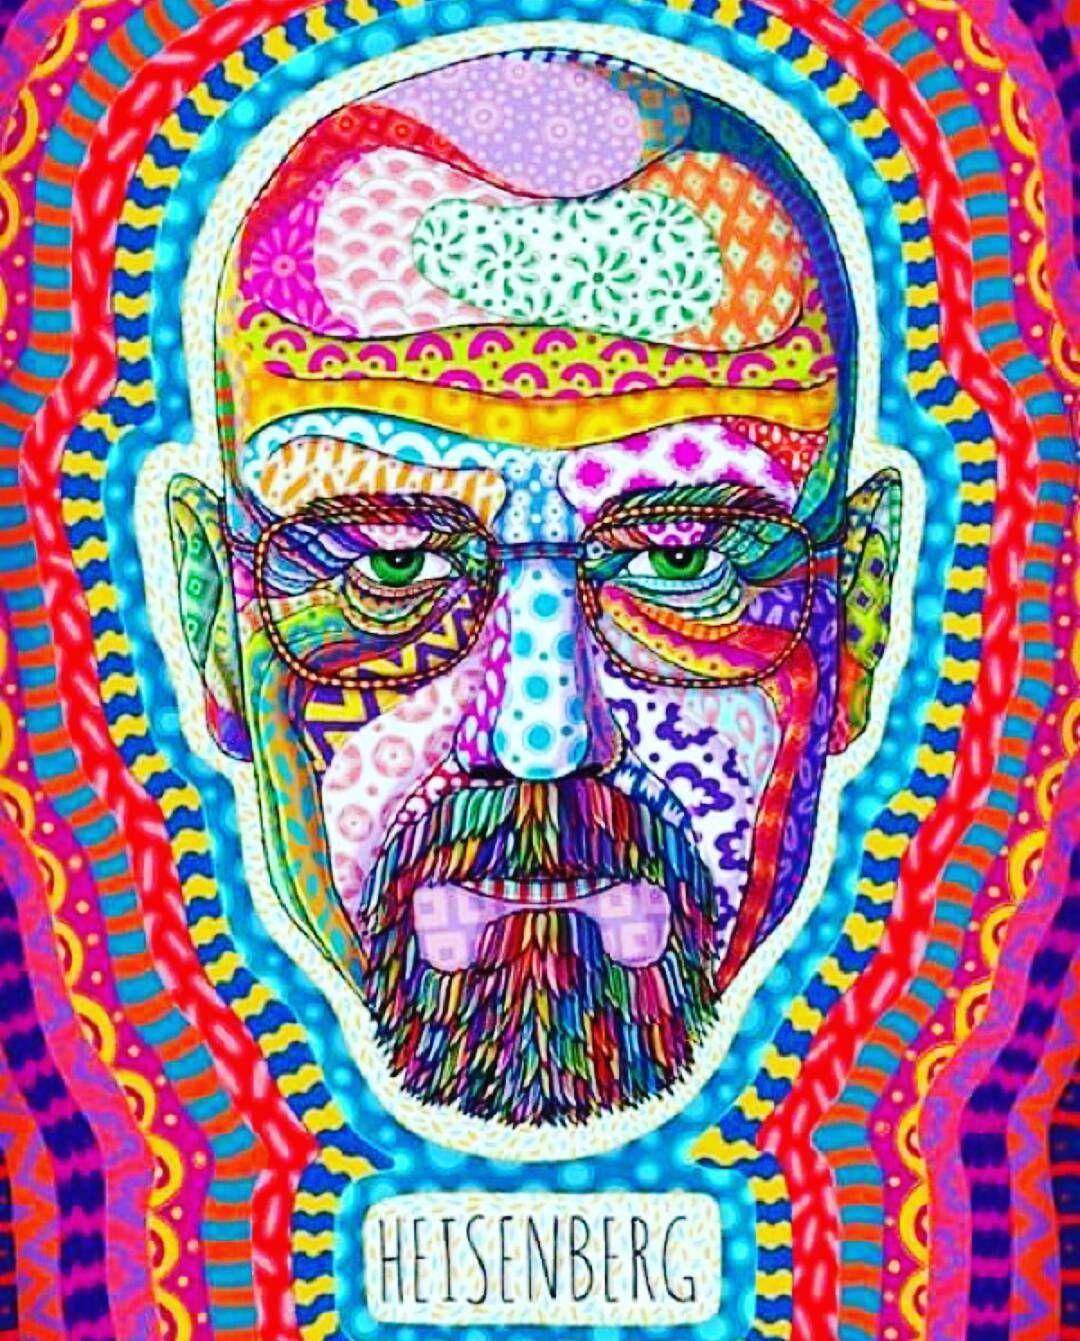 Iphone wallpaper tumblr drugs - Provocative Planet Pics Please Tumblr Com Heisenberg Trippy Cool Art Drugs Acid Lsd Shrooms Weed Maryjane Peace Love Art War Colors Universe